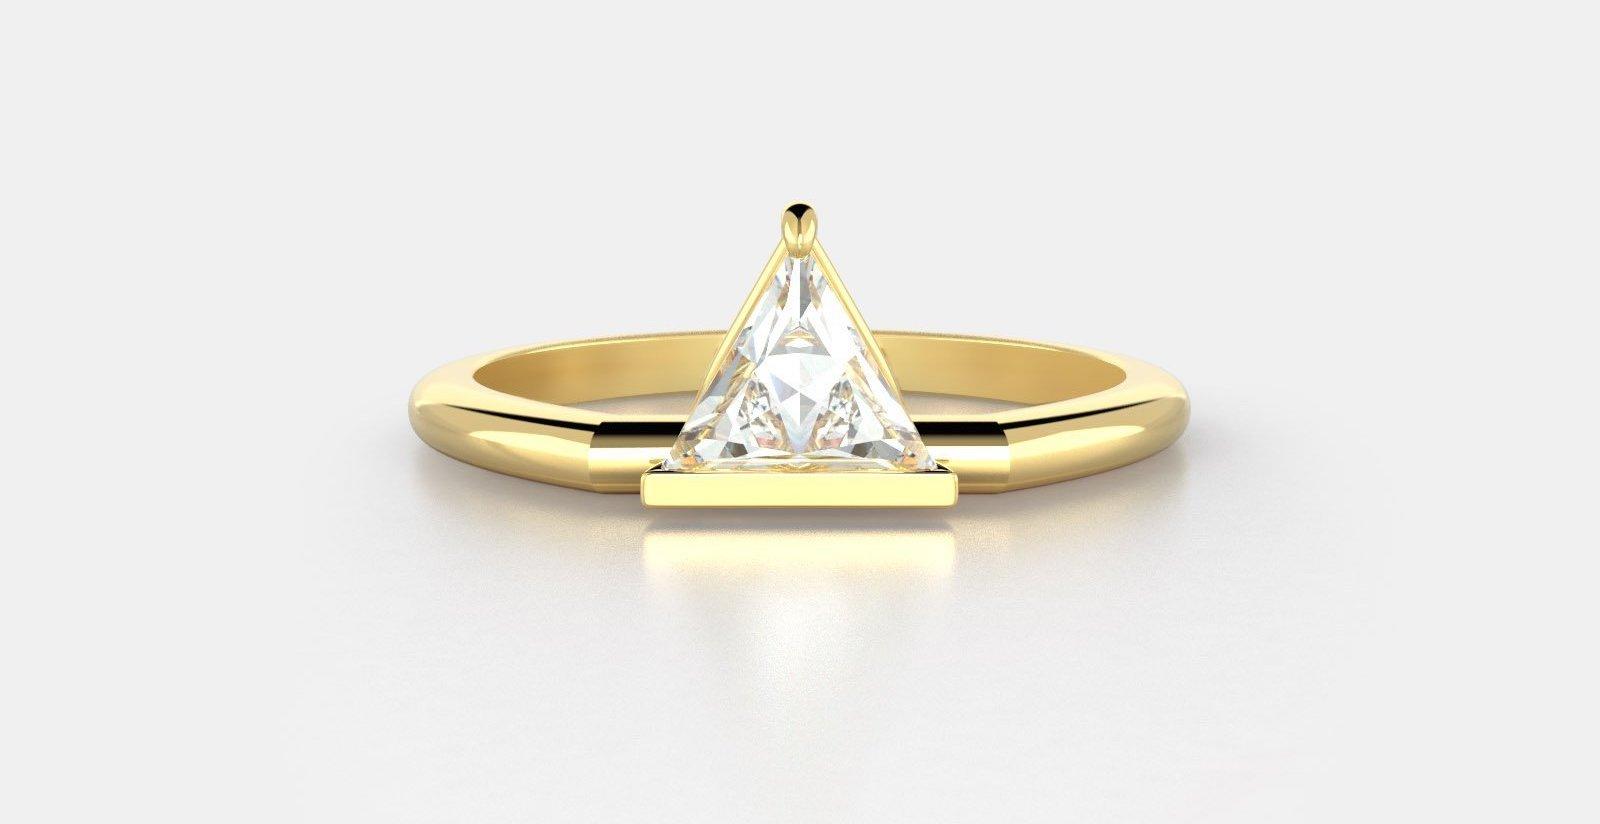 Mason No. 5 a bar set triangle diamond in 18K yellow gold.